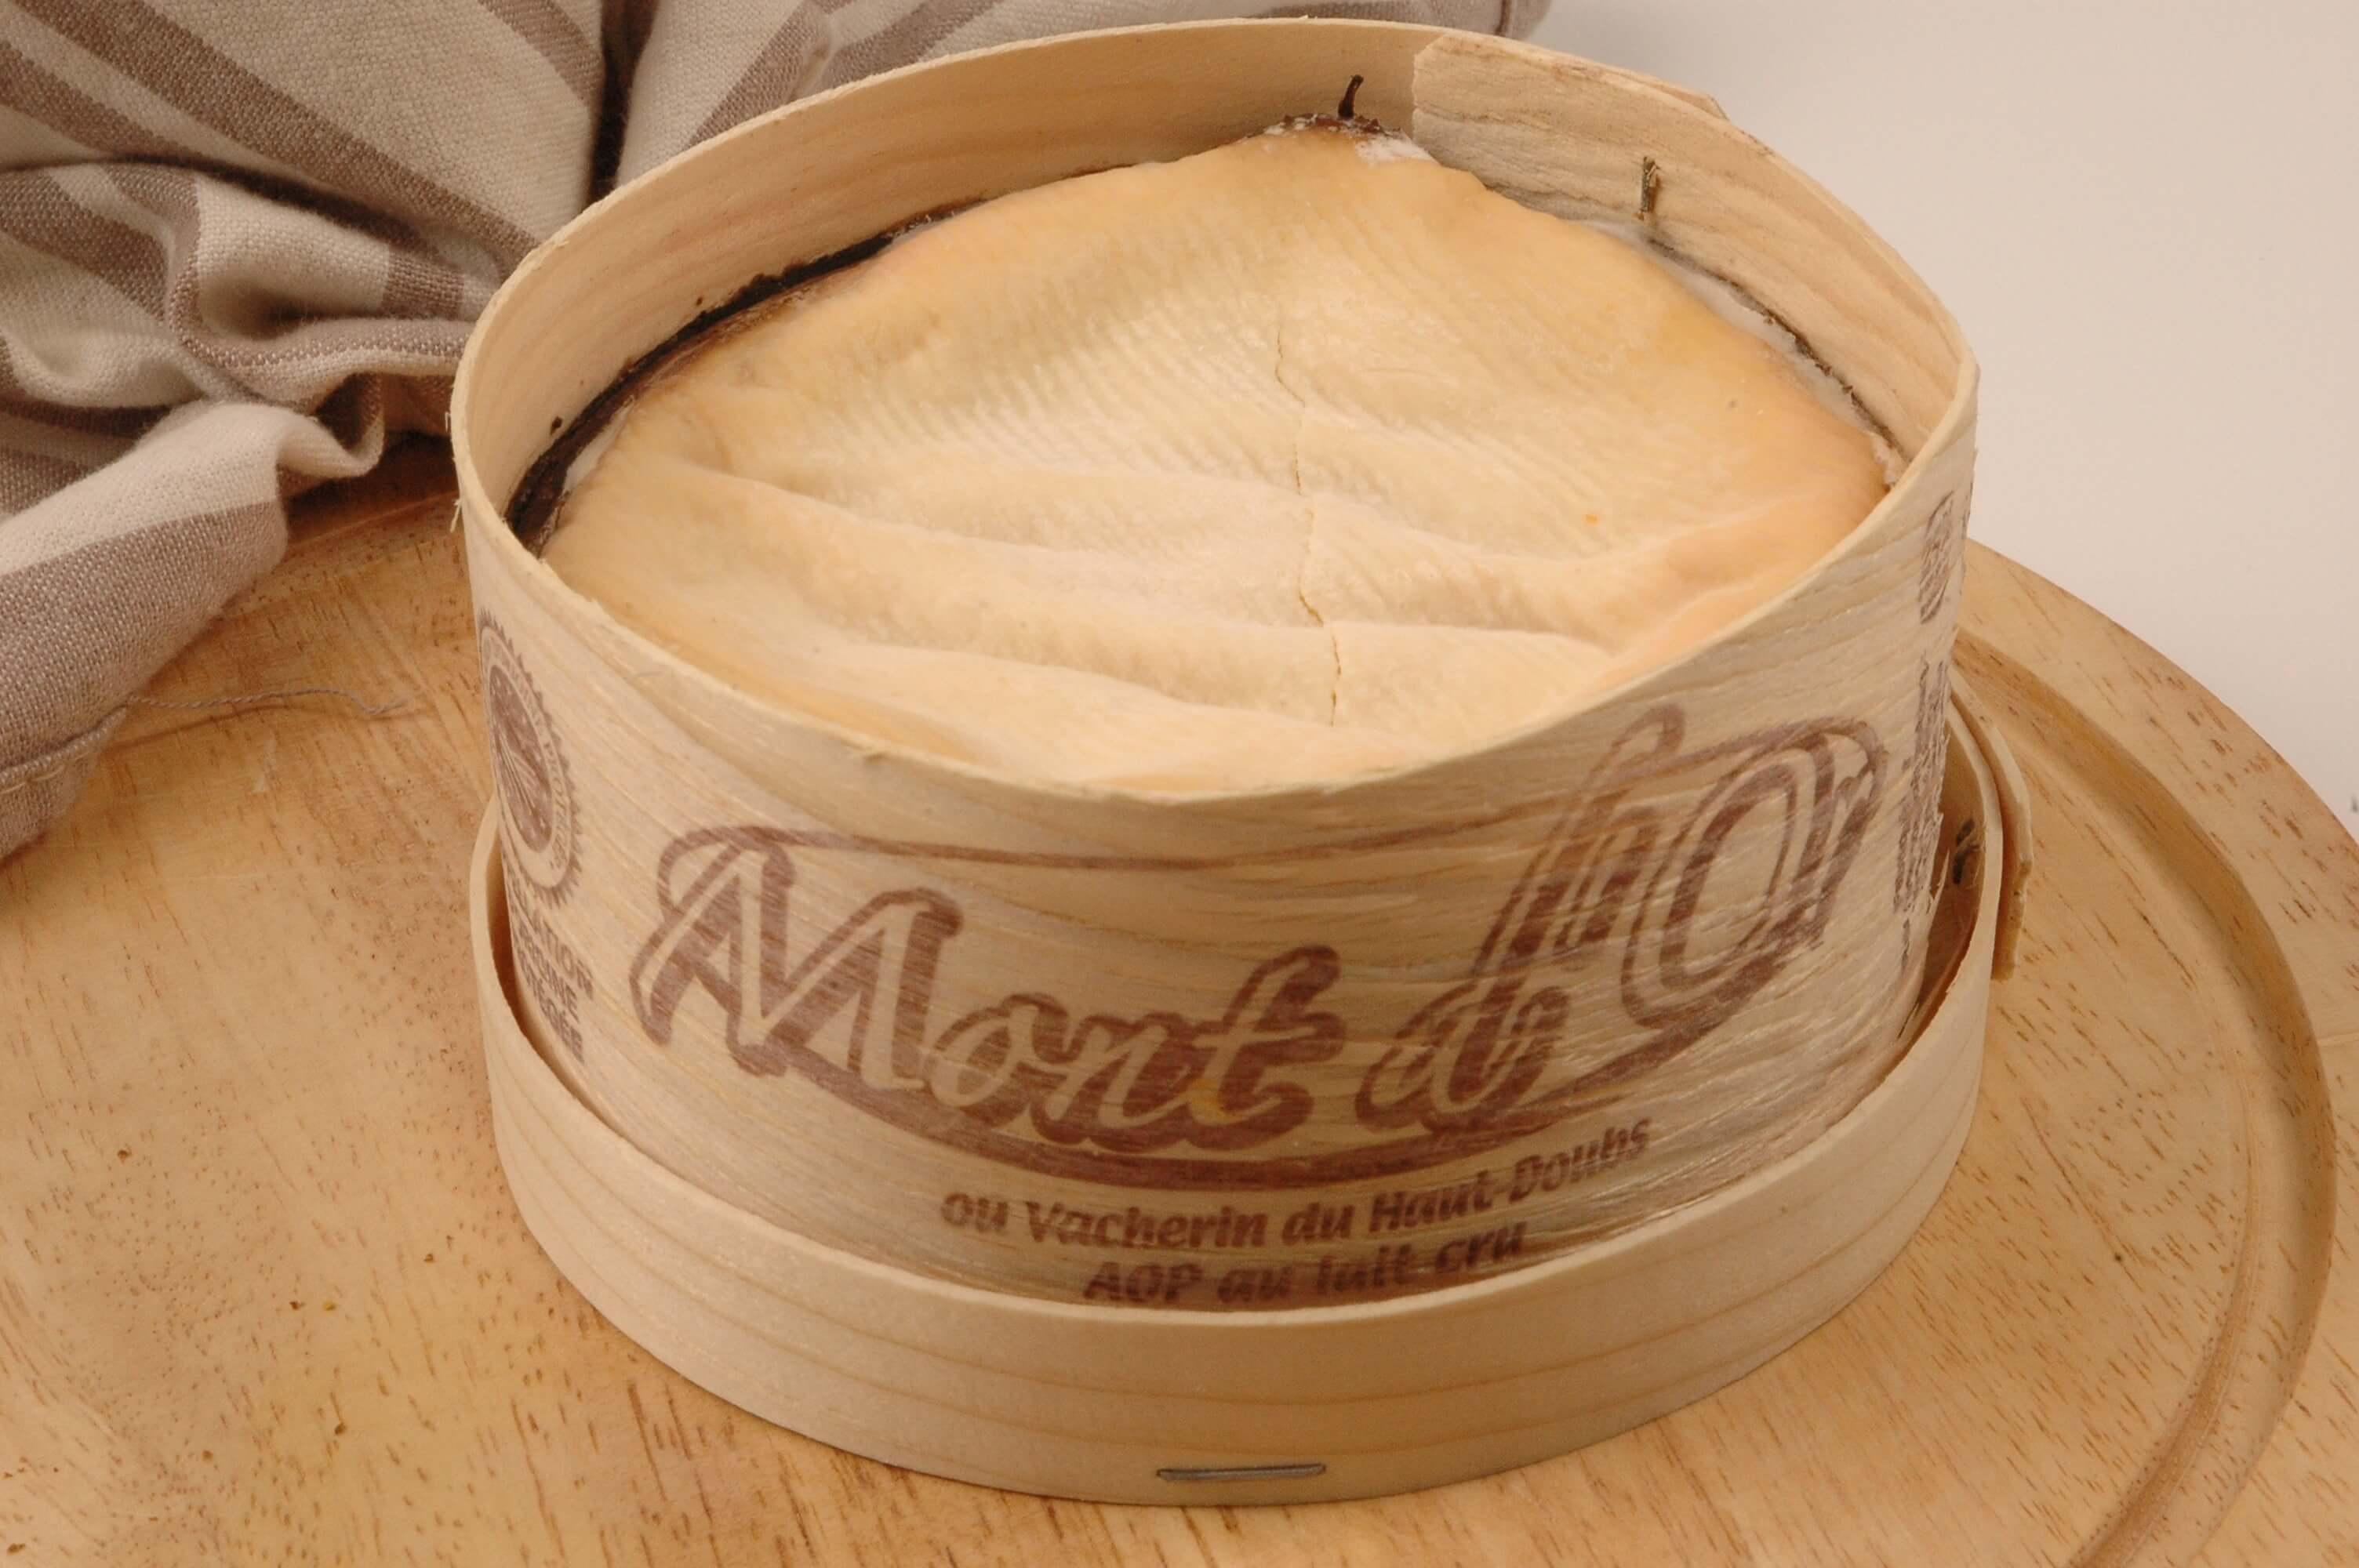 Emballage en bois de fromage